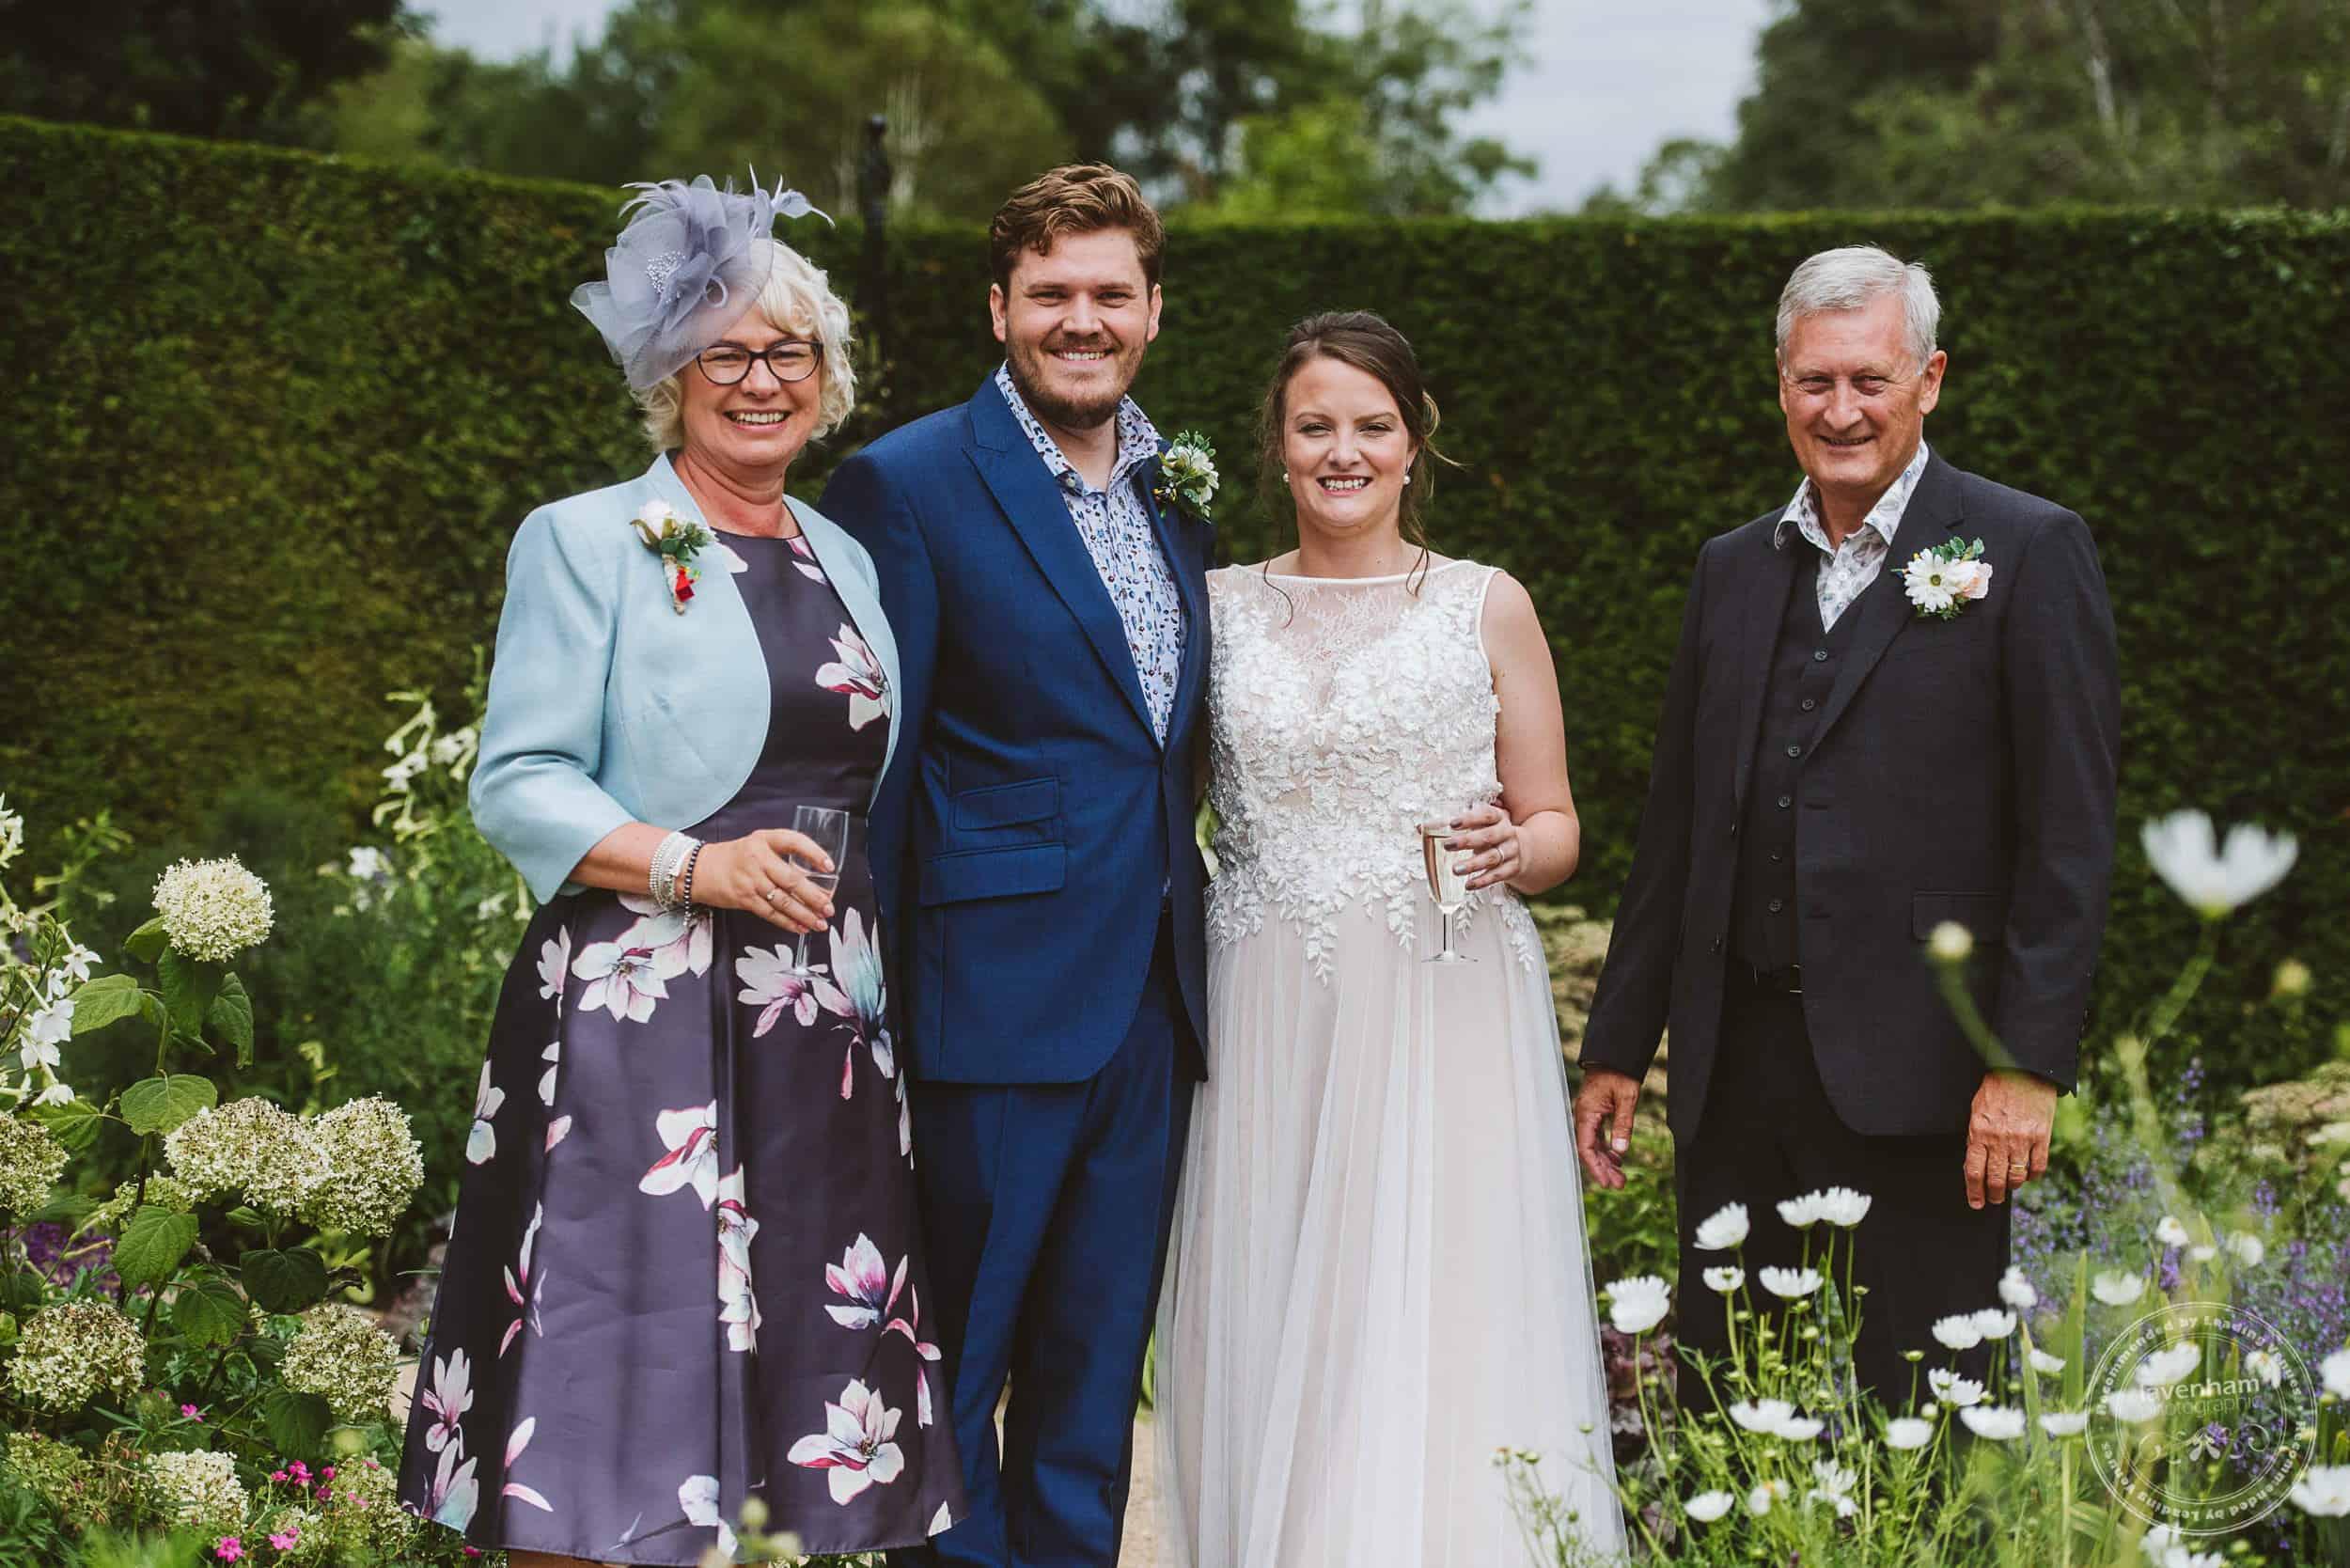 180818 Marks Hall Wedding Photography Lavenham Photographic 086